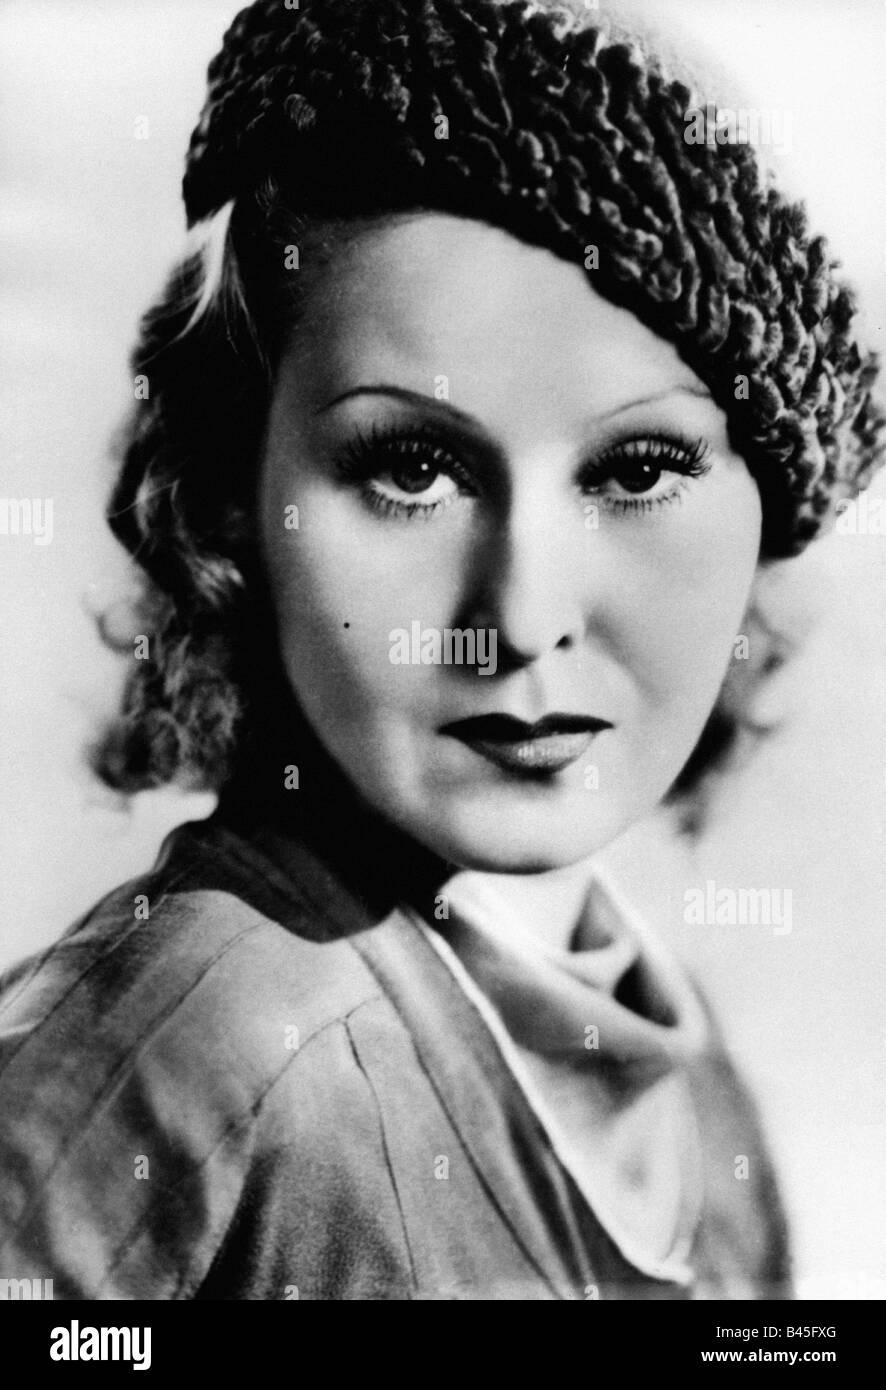 Harvey, Lillian, 19.1.1906 - 27.7.1968, British actress, portrait, 1930s, flap, hat, accessory, headgear,  clothing, - Stock Image